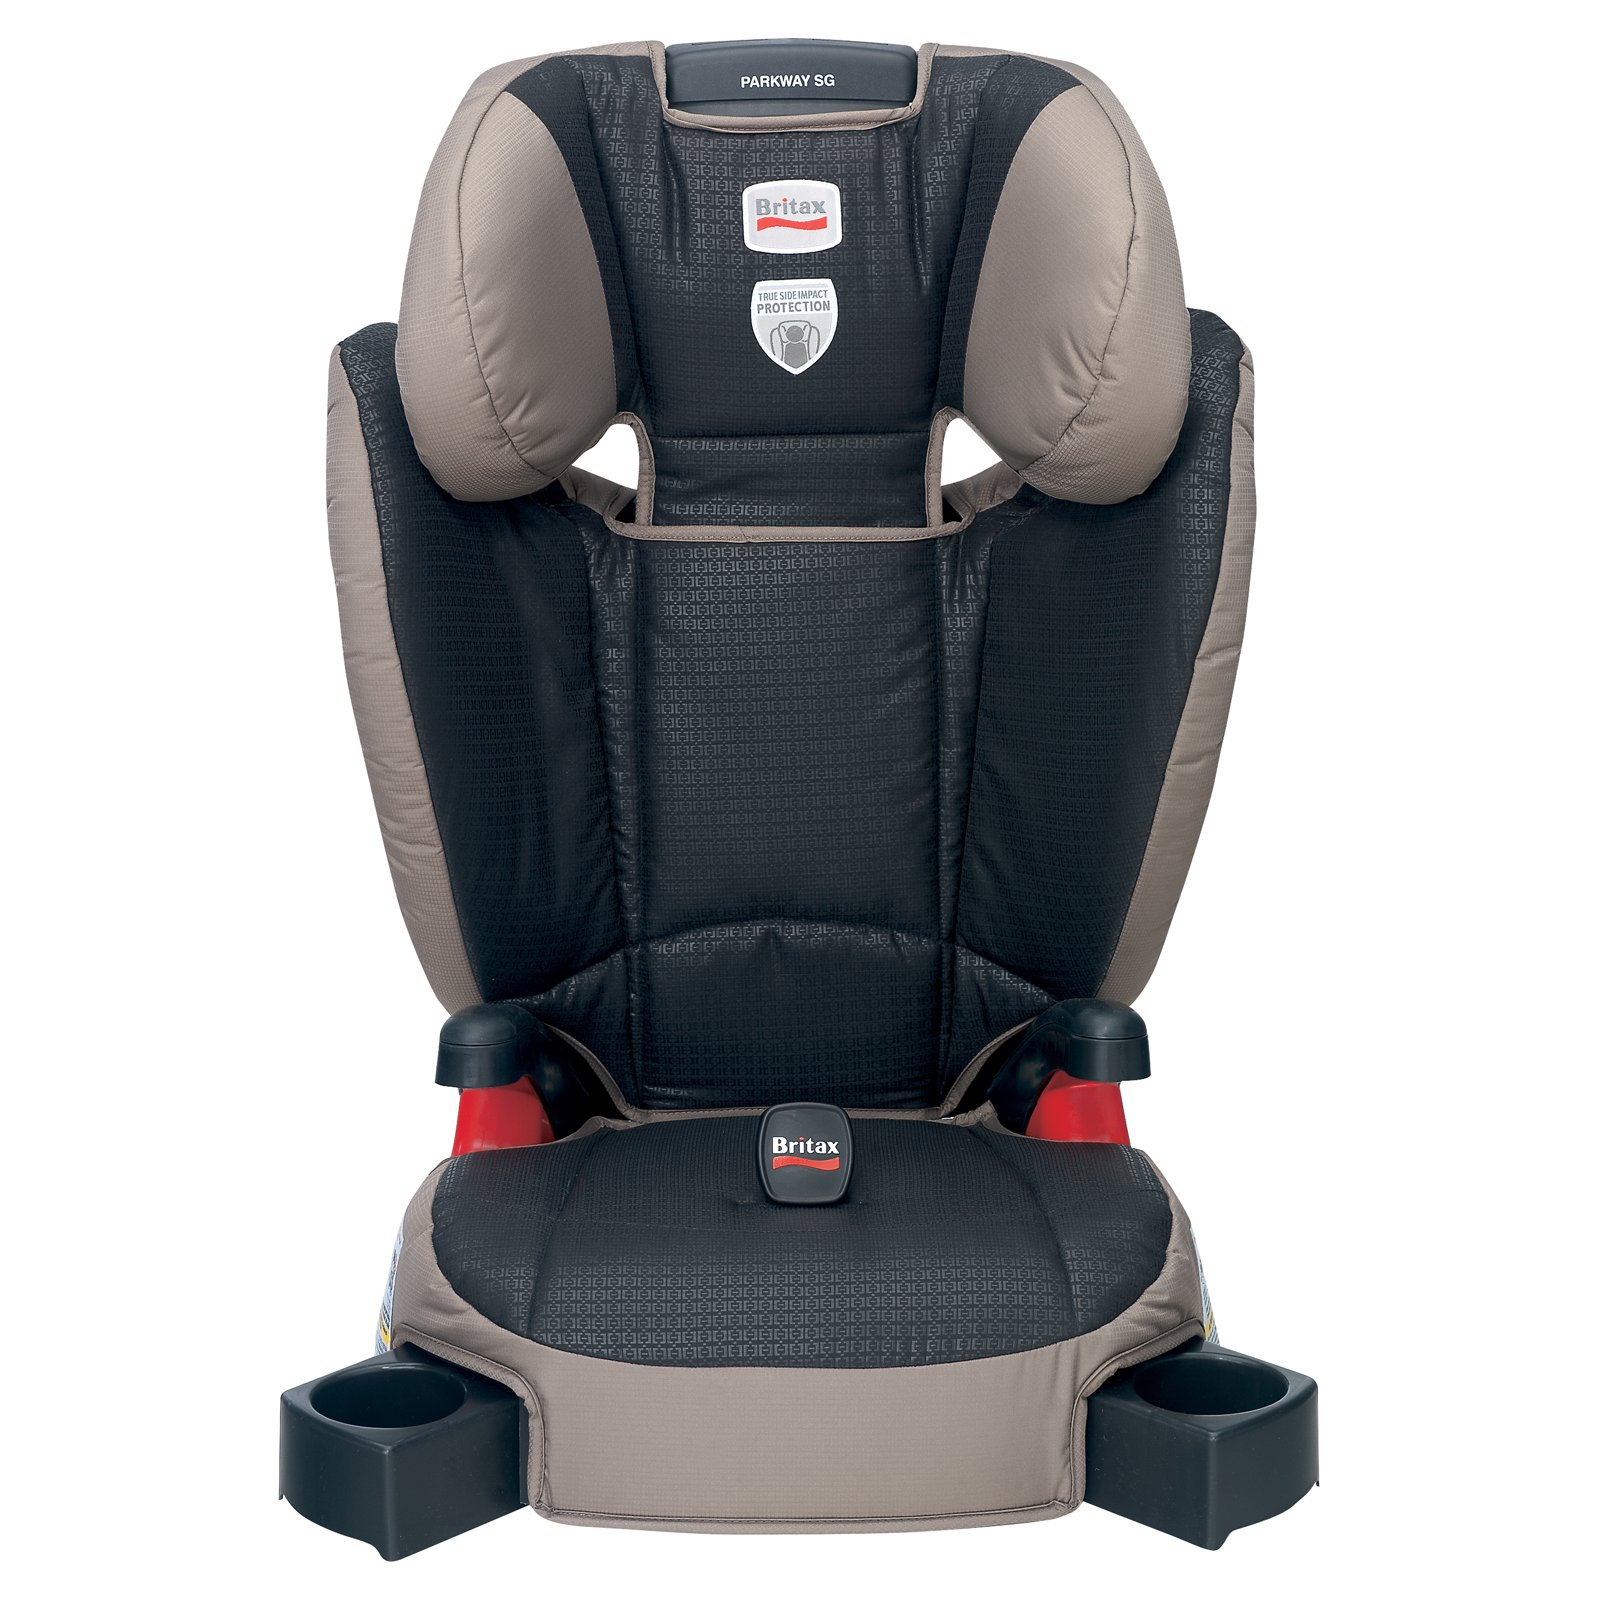 Britax Parkway SG High Back Booster Car Seat Walmart